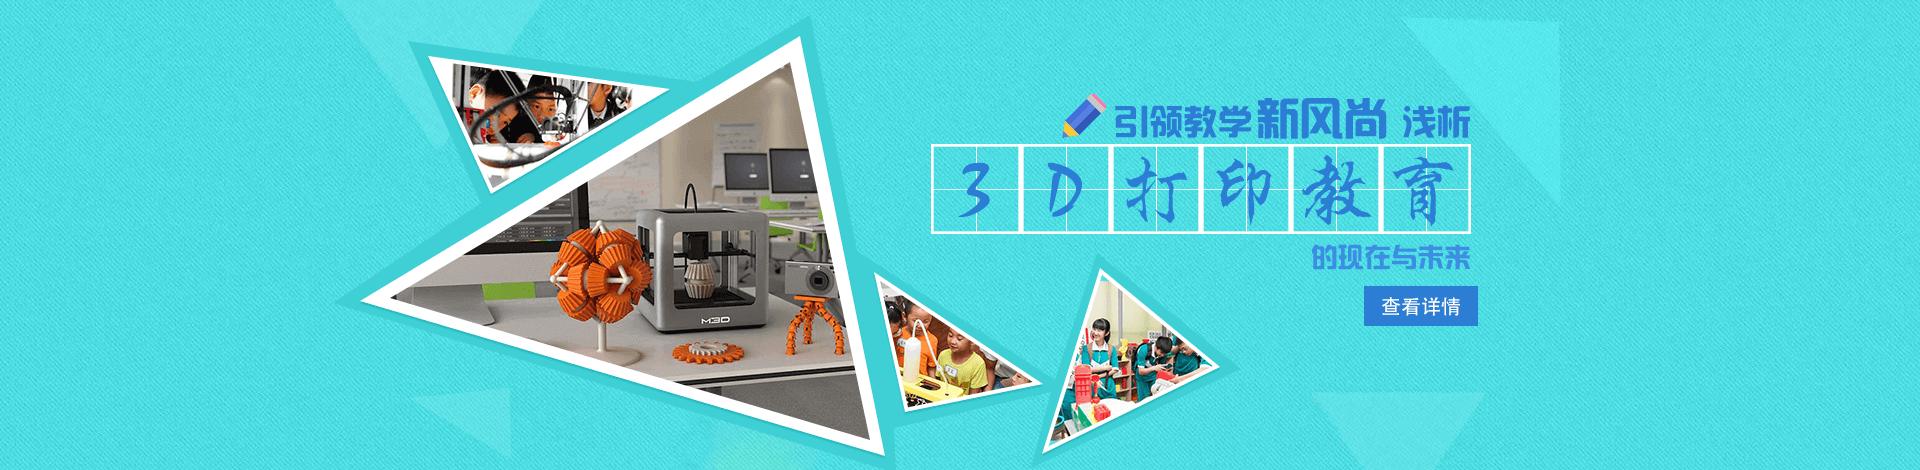 3D打印教育